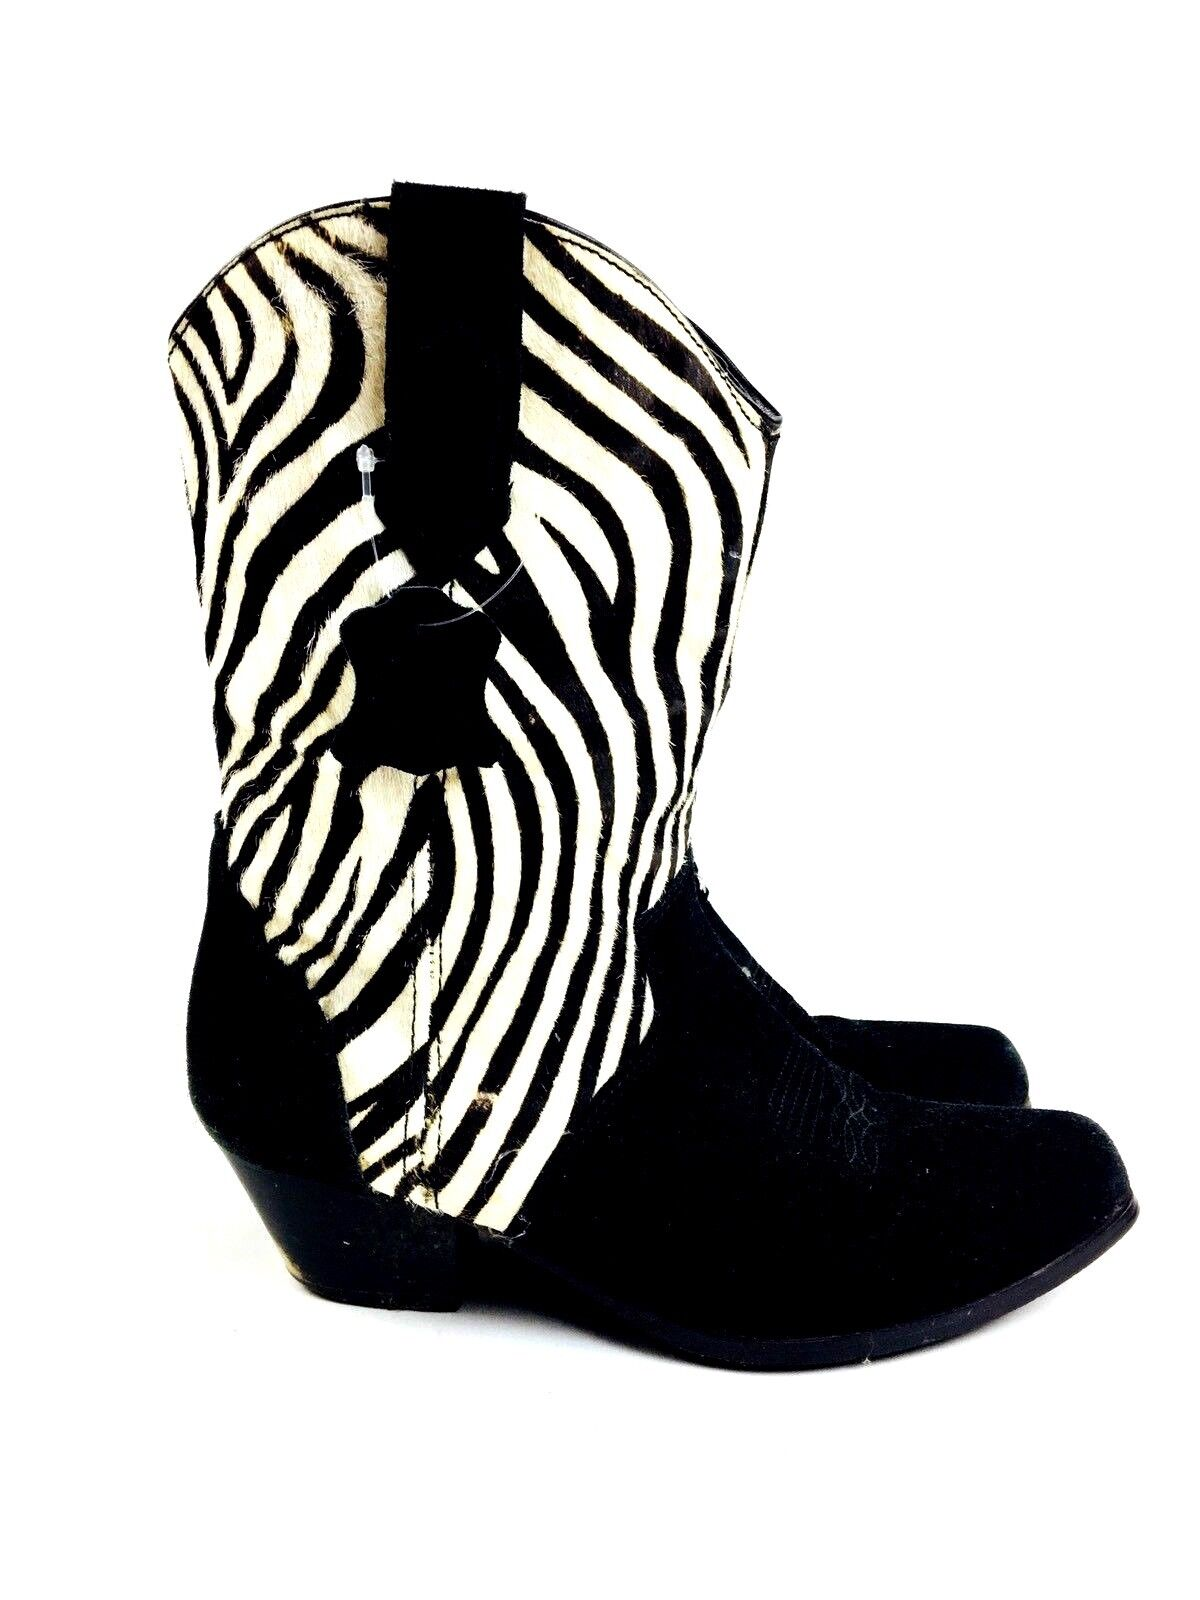 Zebra Cowboy Boots Women's Shoes Women's Boots He… - image 5